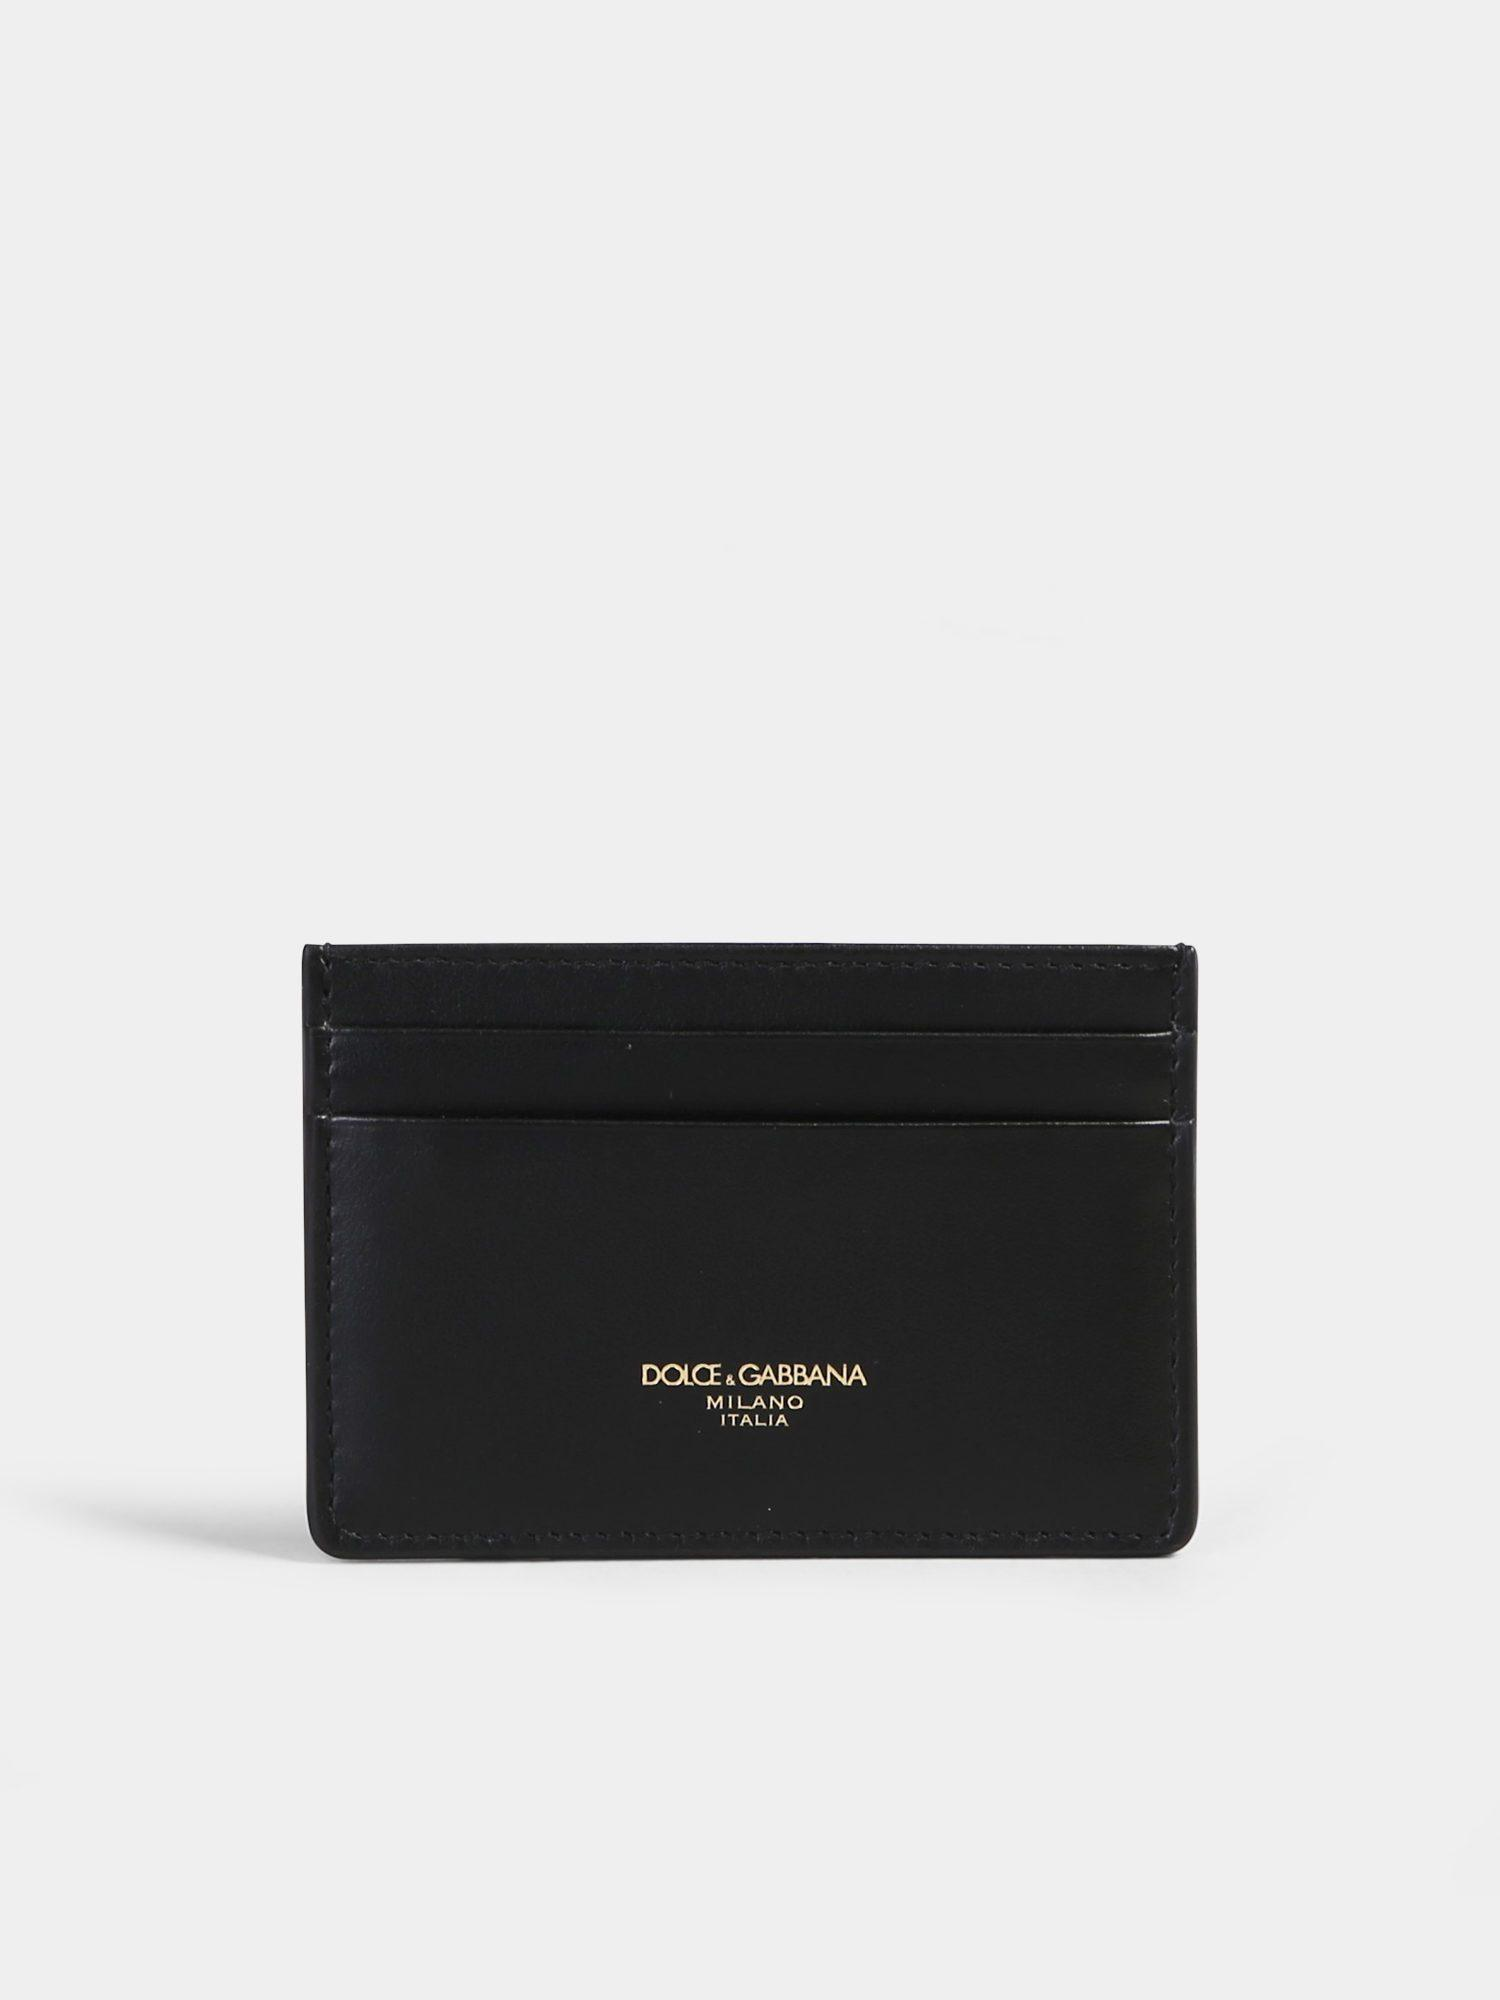 b5cb2a8e79 Lyst - Dolce & Gabbana Leather Card Holder in Black for Men